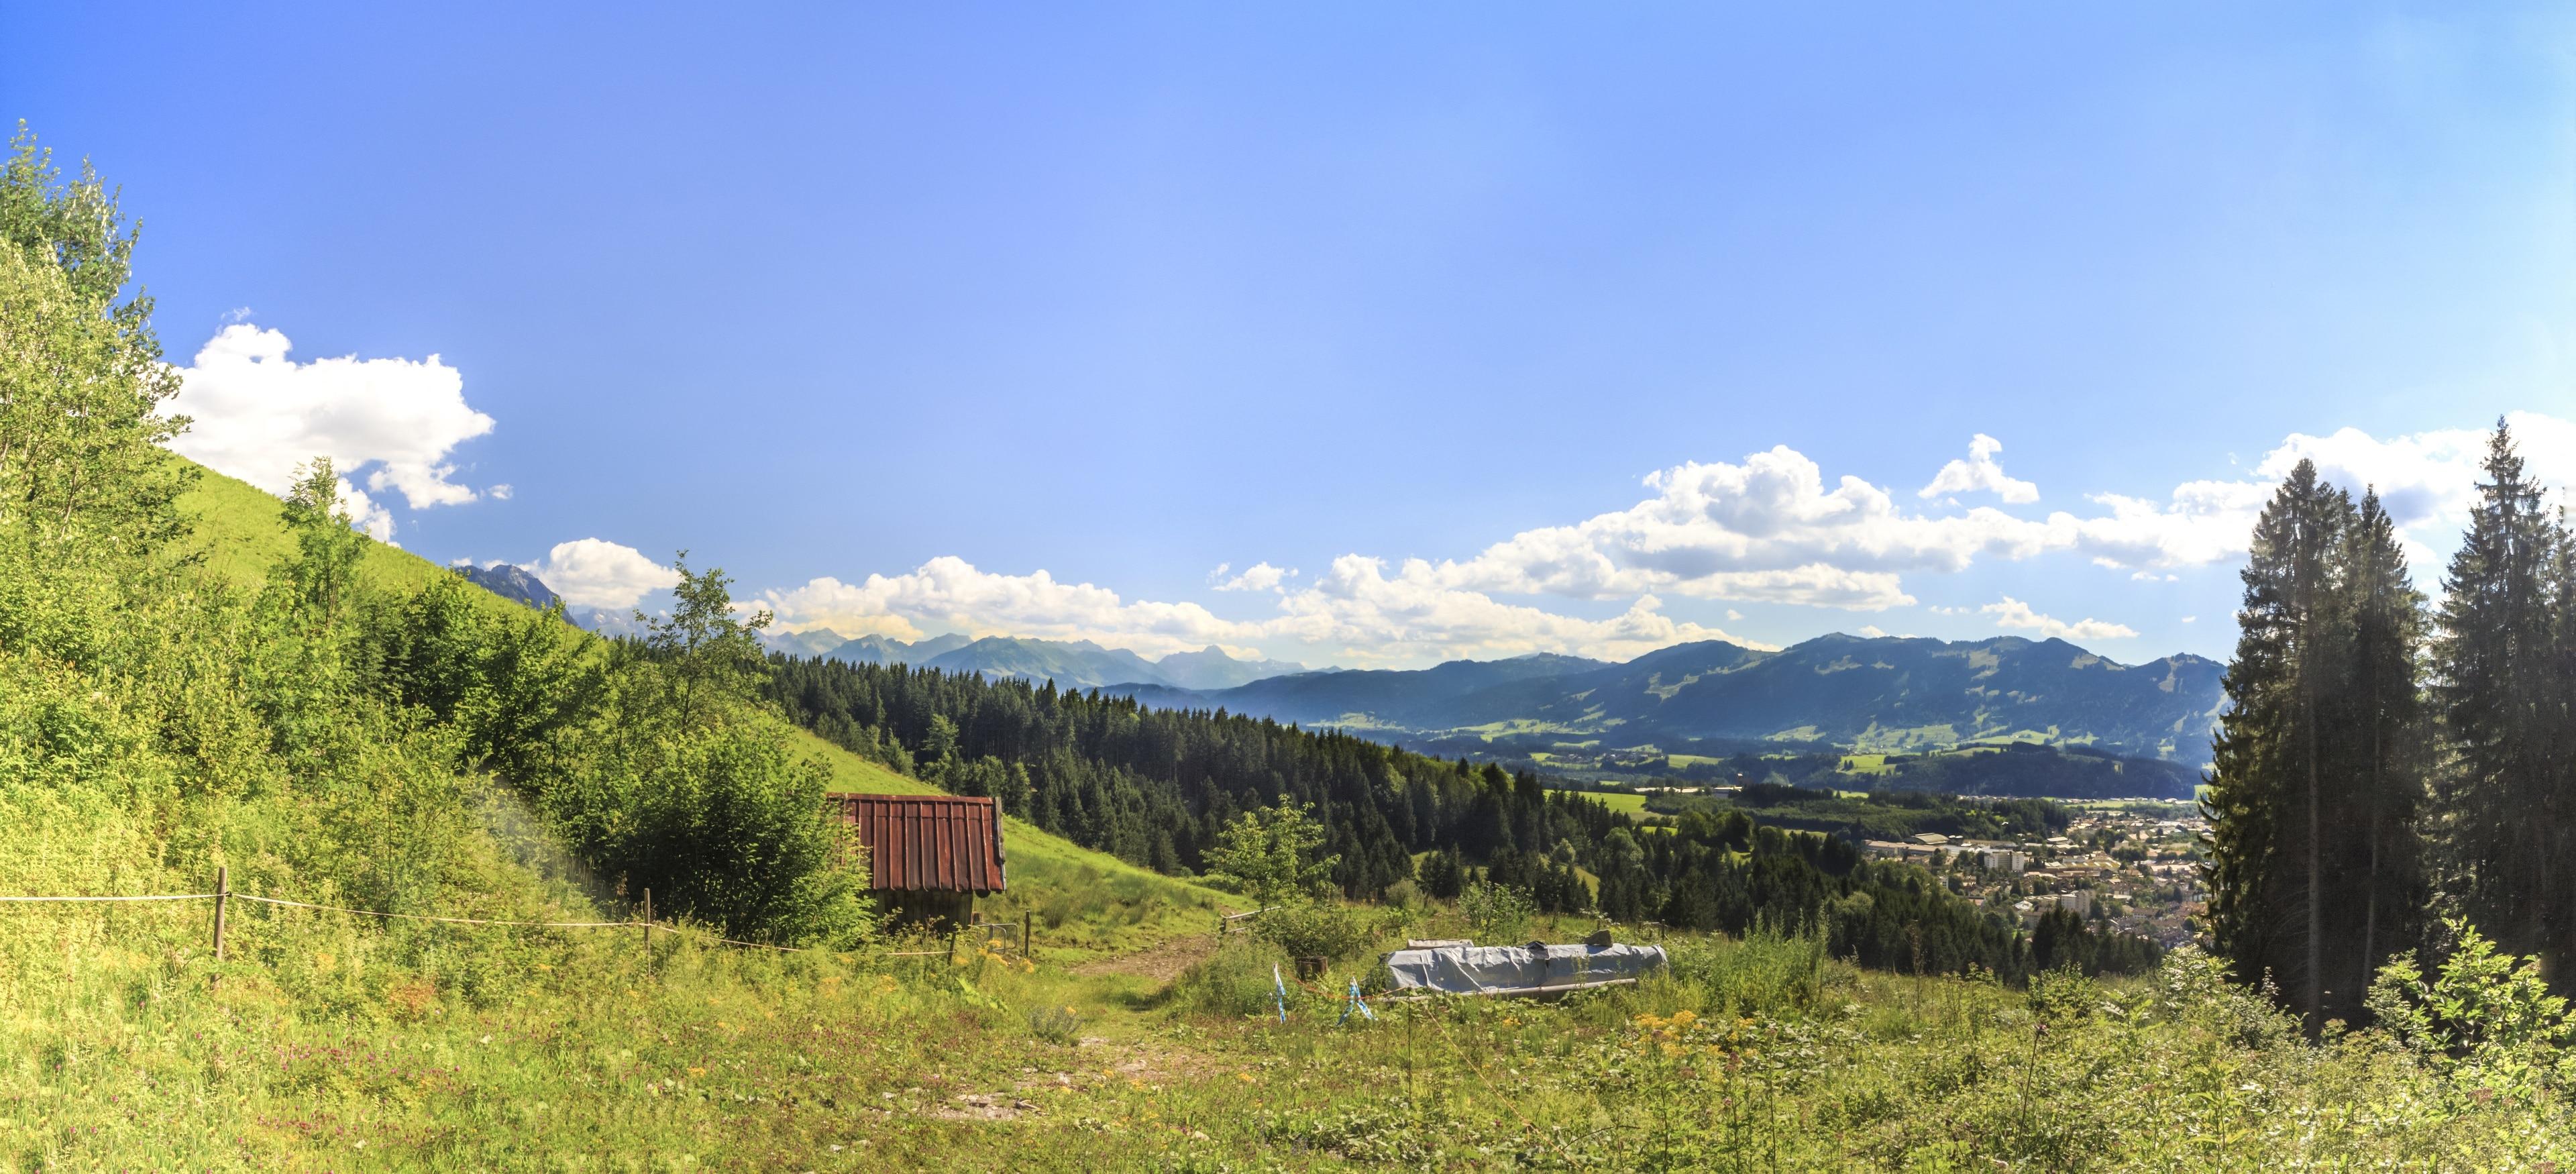 Allgäu Alps